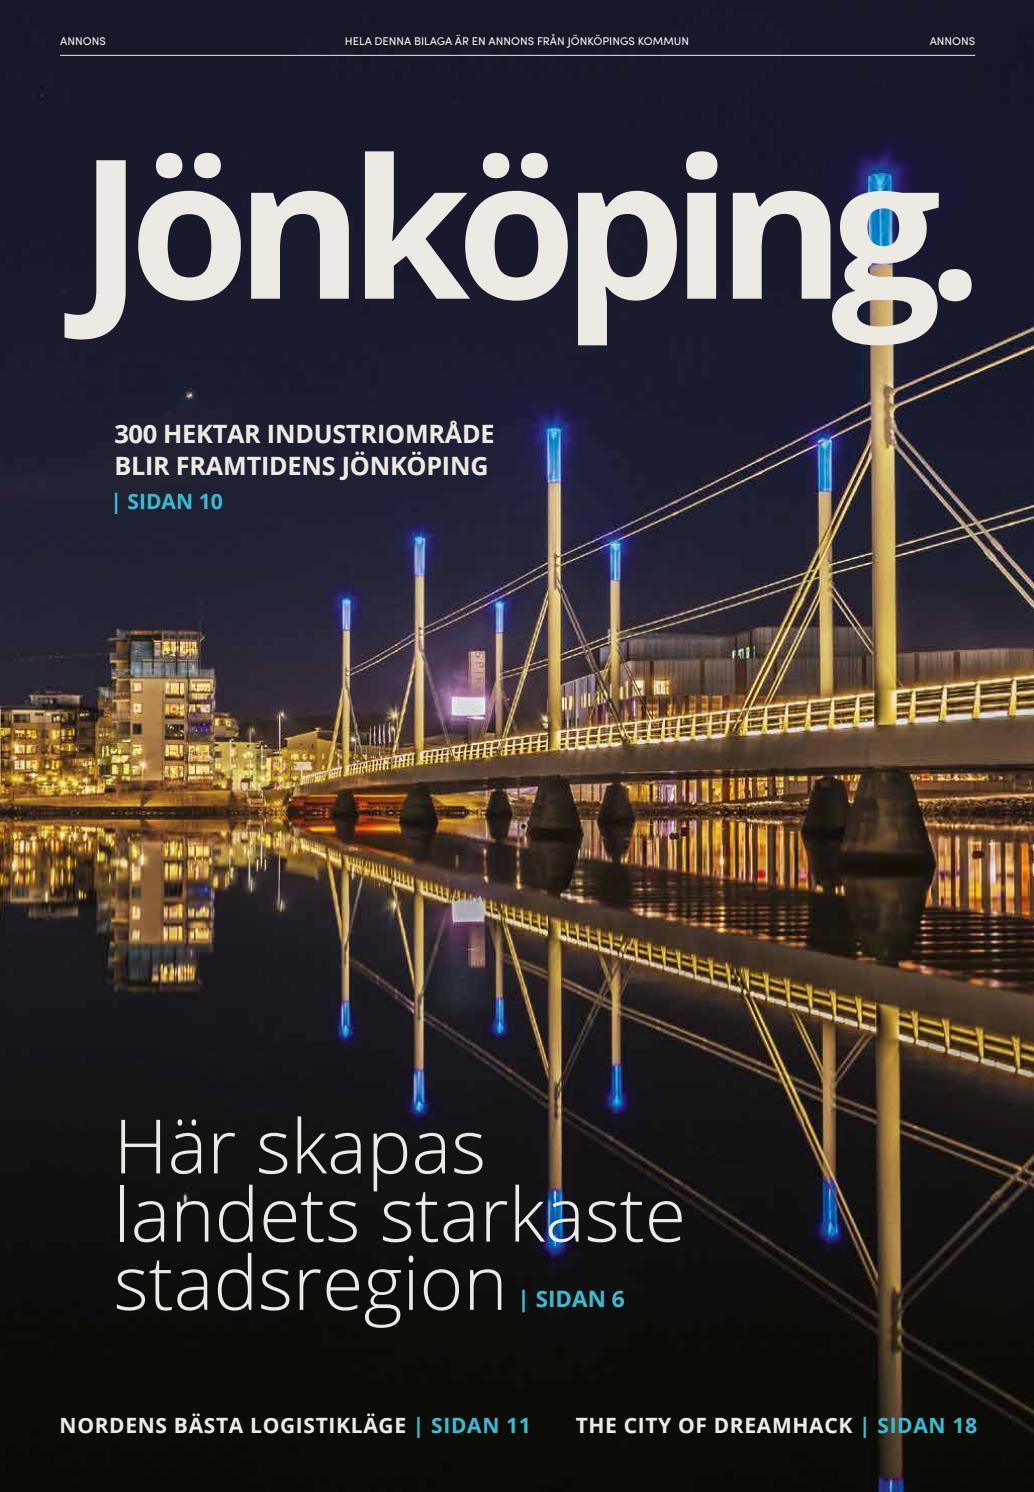 42485f28686c Jönköping by Crossmedia Communication - issuu